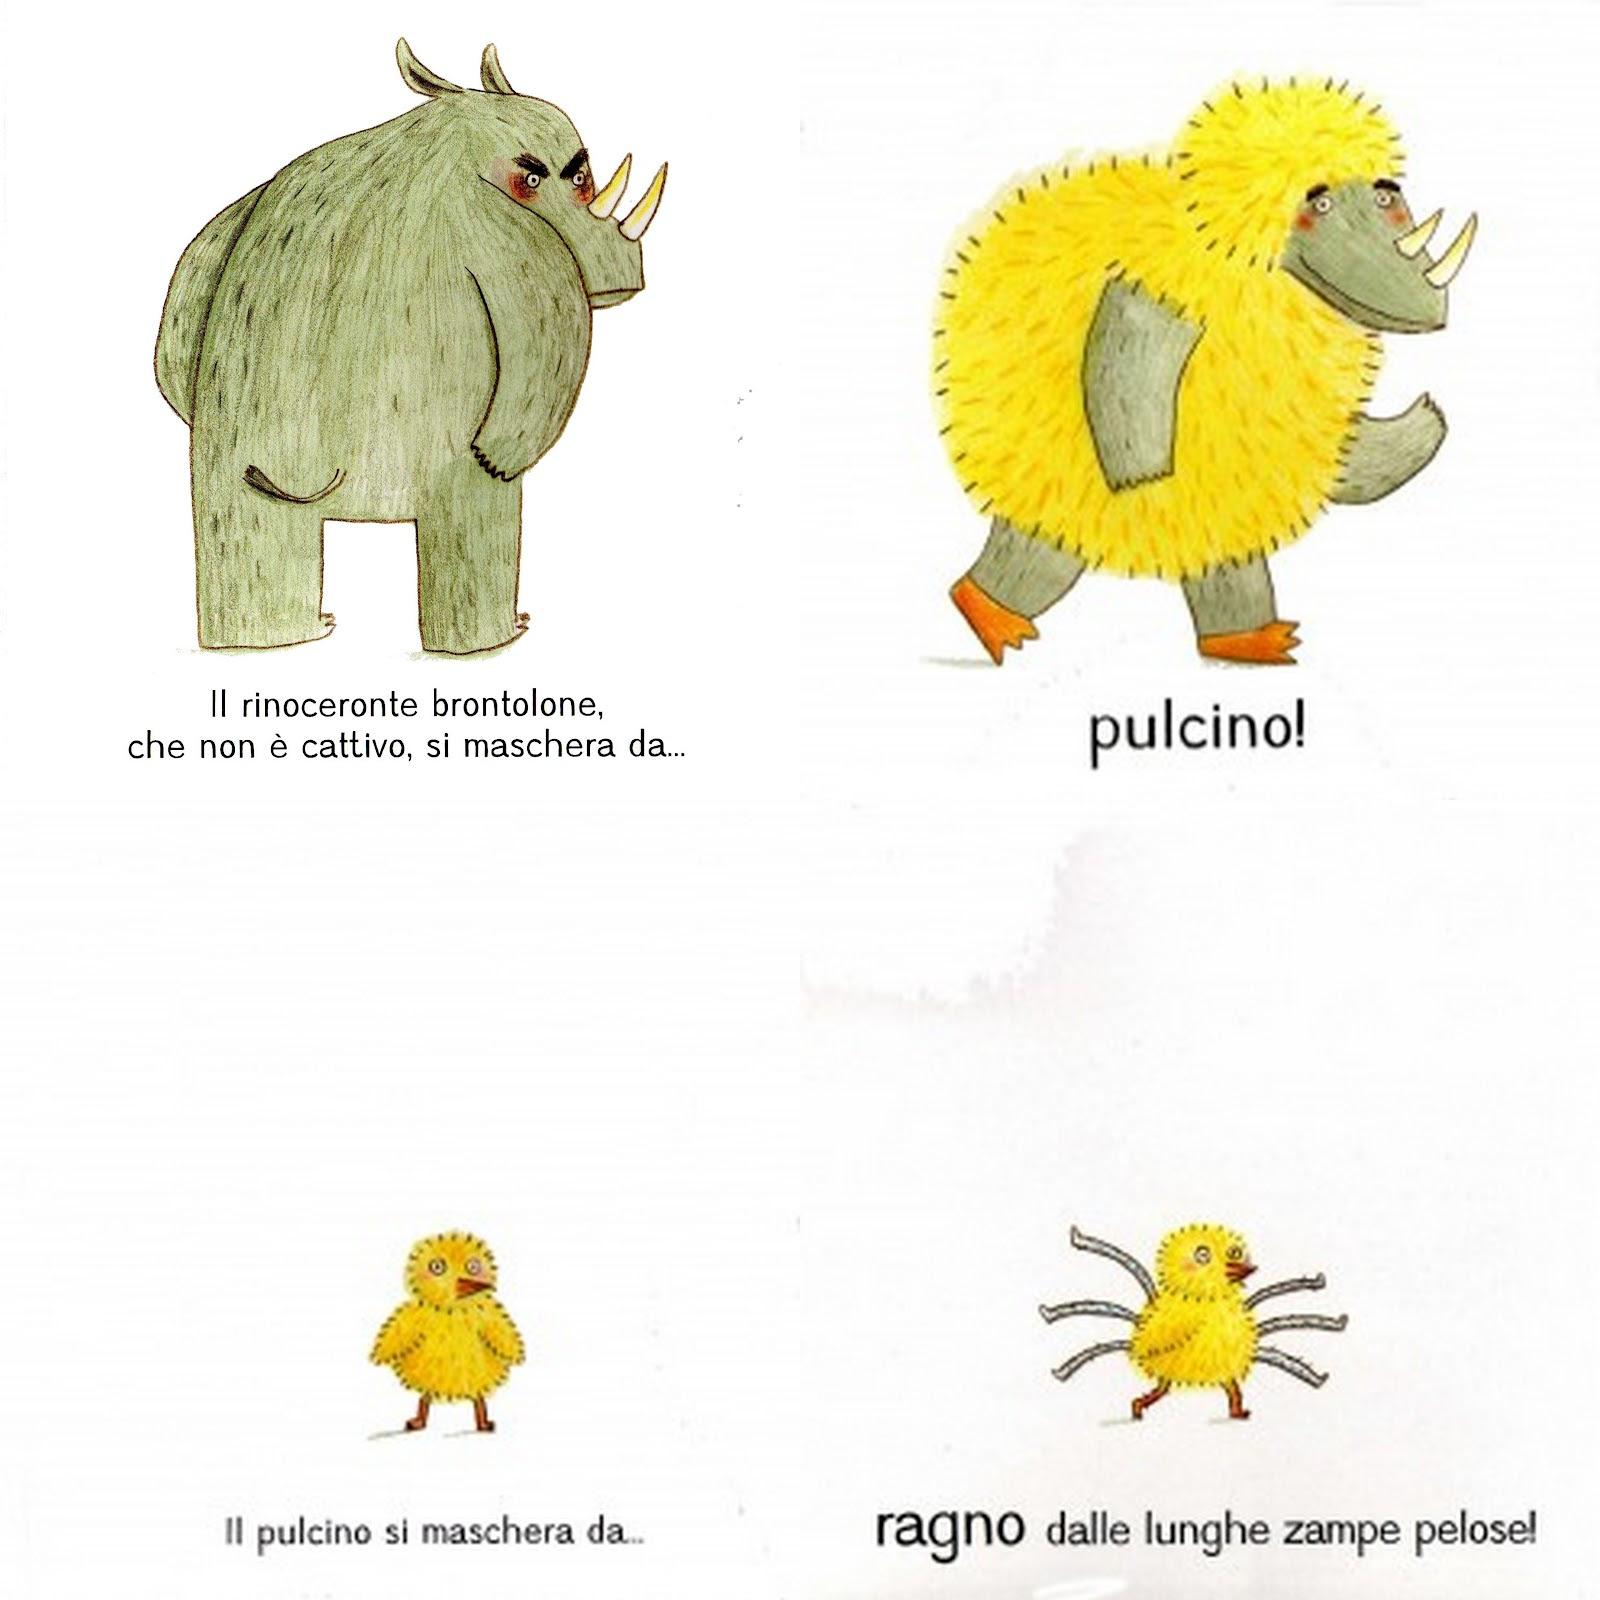 http://libriemarmellata.files.wordpress.com/2012/10/collage.jpg